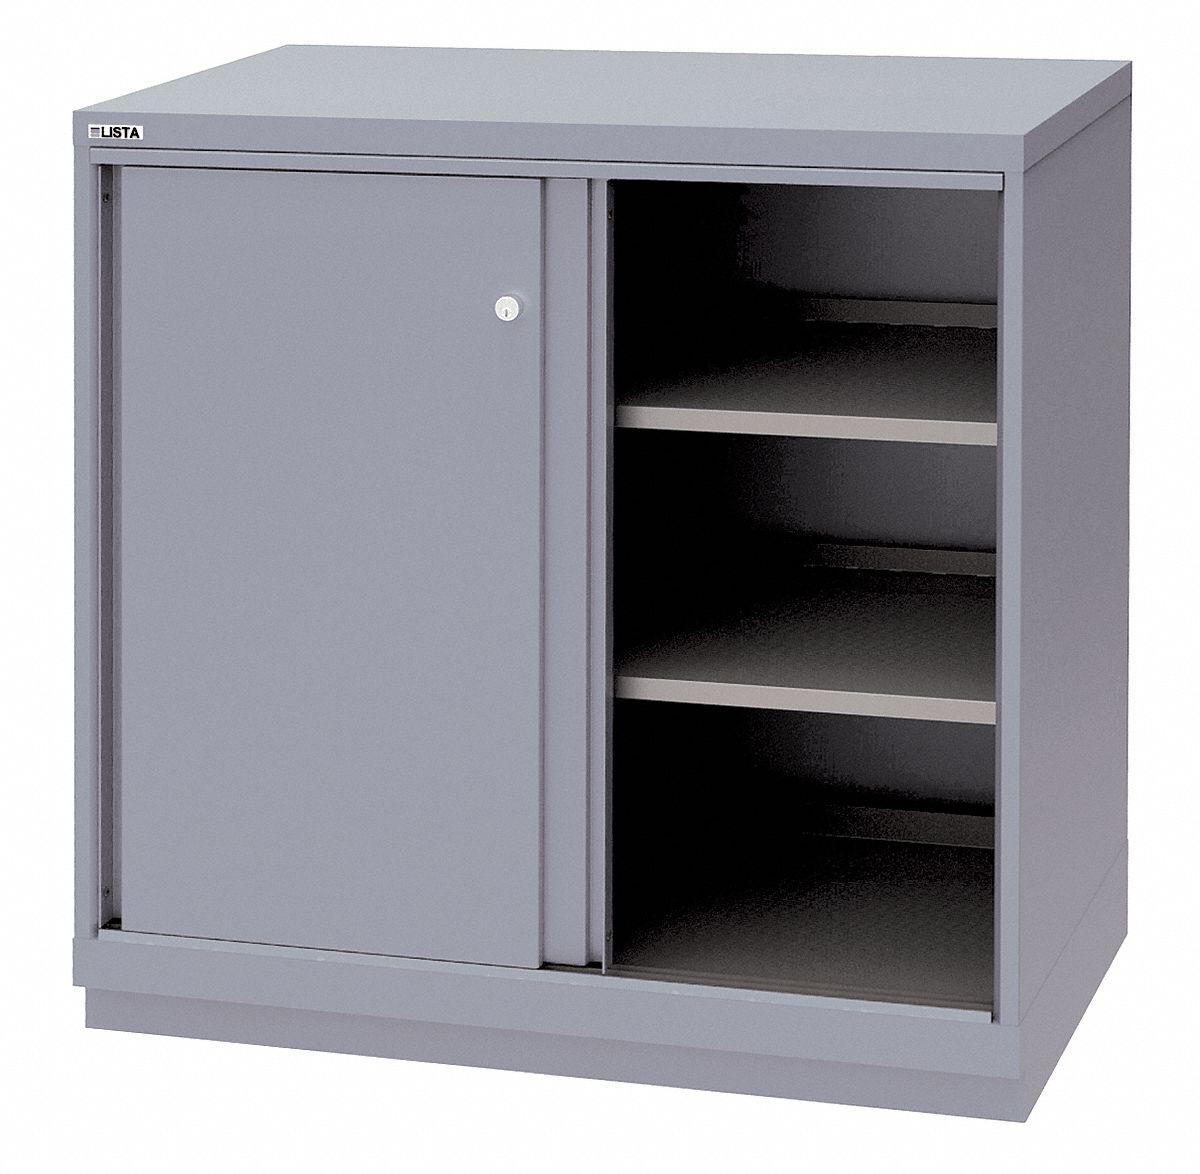 "Buy Replacement Kitchen Cabinet Doors: LISTA Base Cabinet, Sliding Doors, 40-1/4""W X 22-1/2""D X"